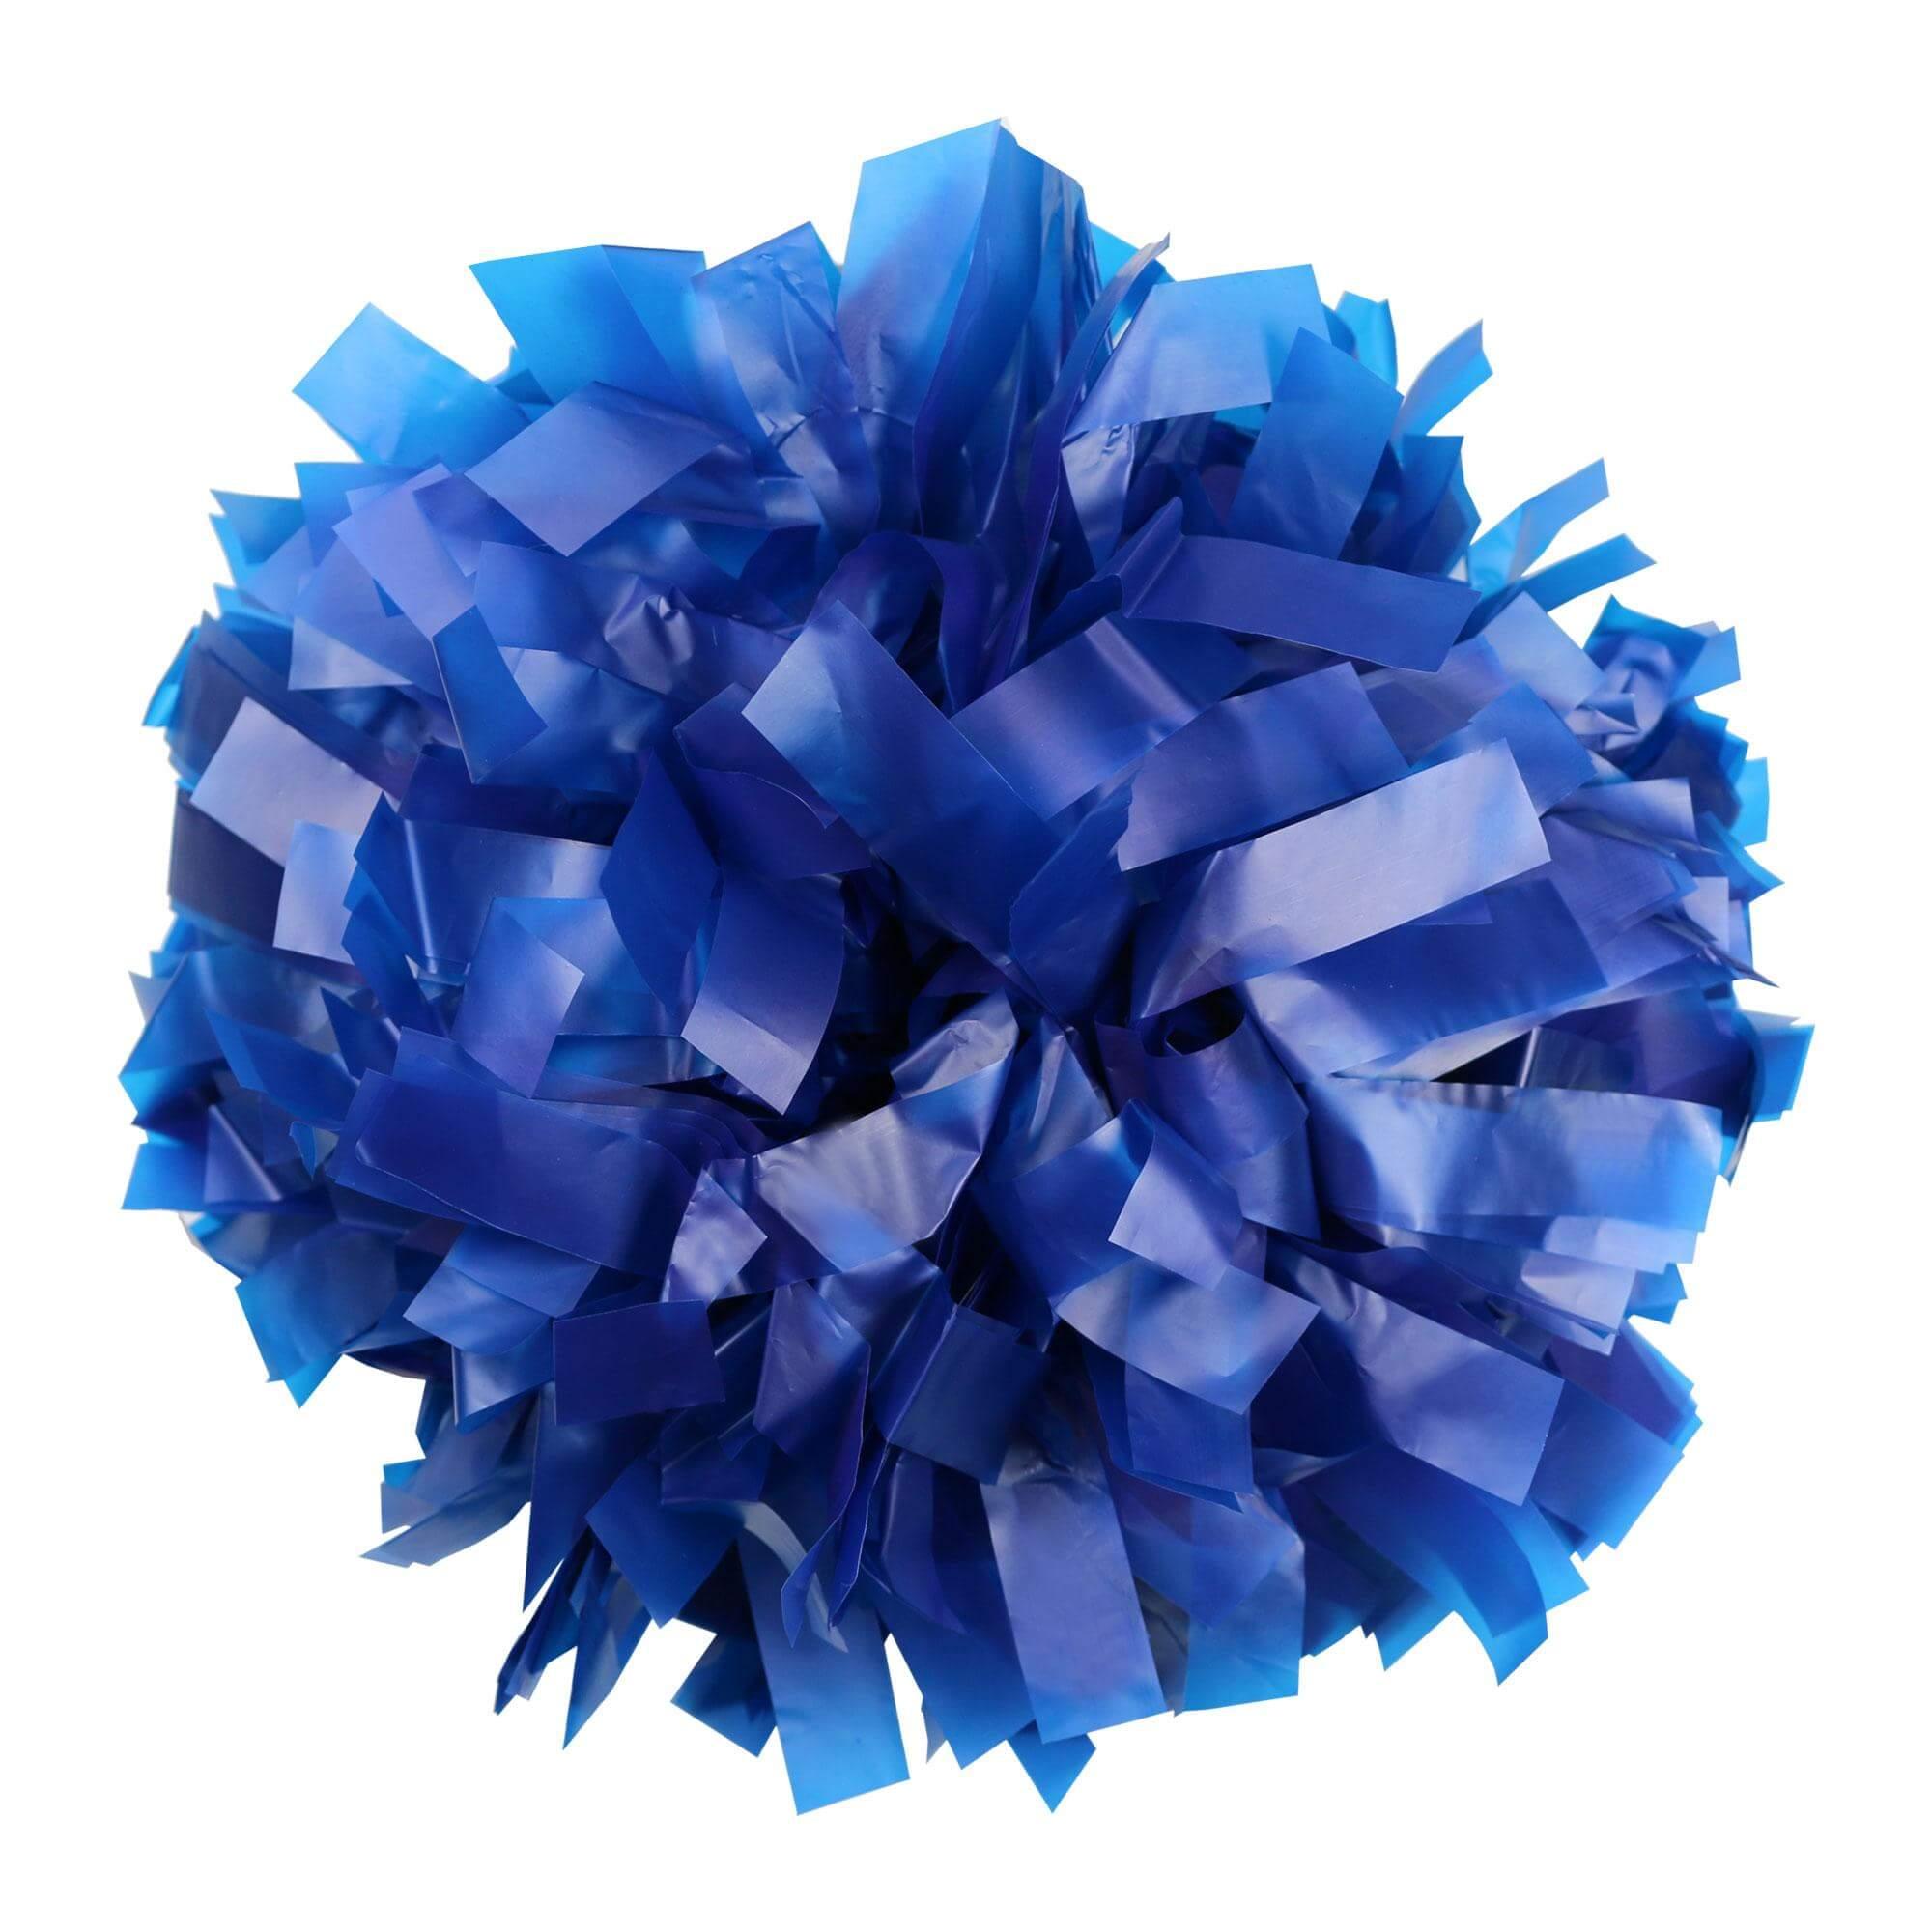 Danzcue Royal Blue Plastic Poms